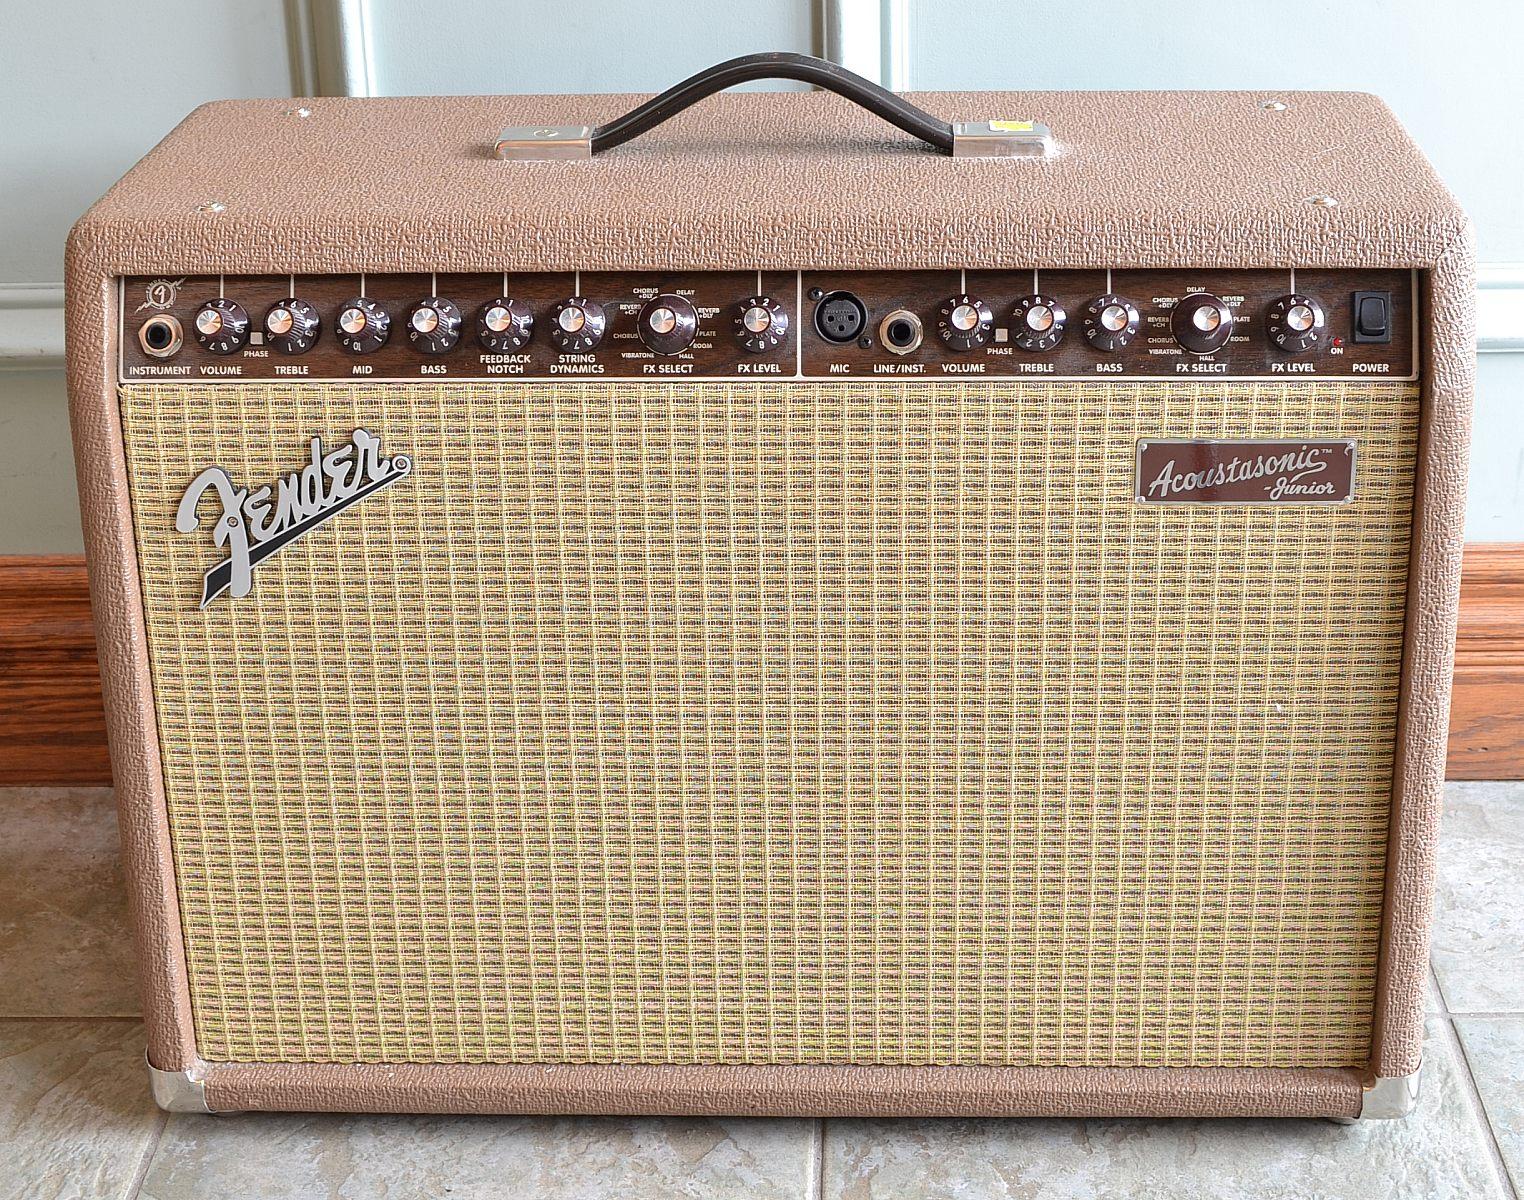 fender acoustasonic jr dsp used sold the twelfth fret guitarists 39 pro shop